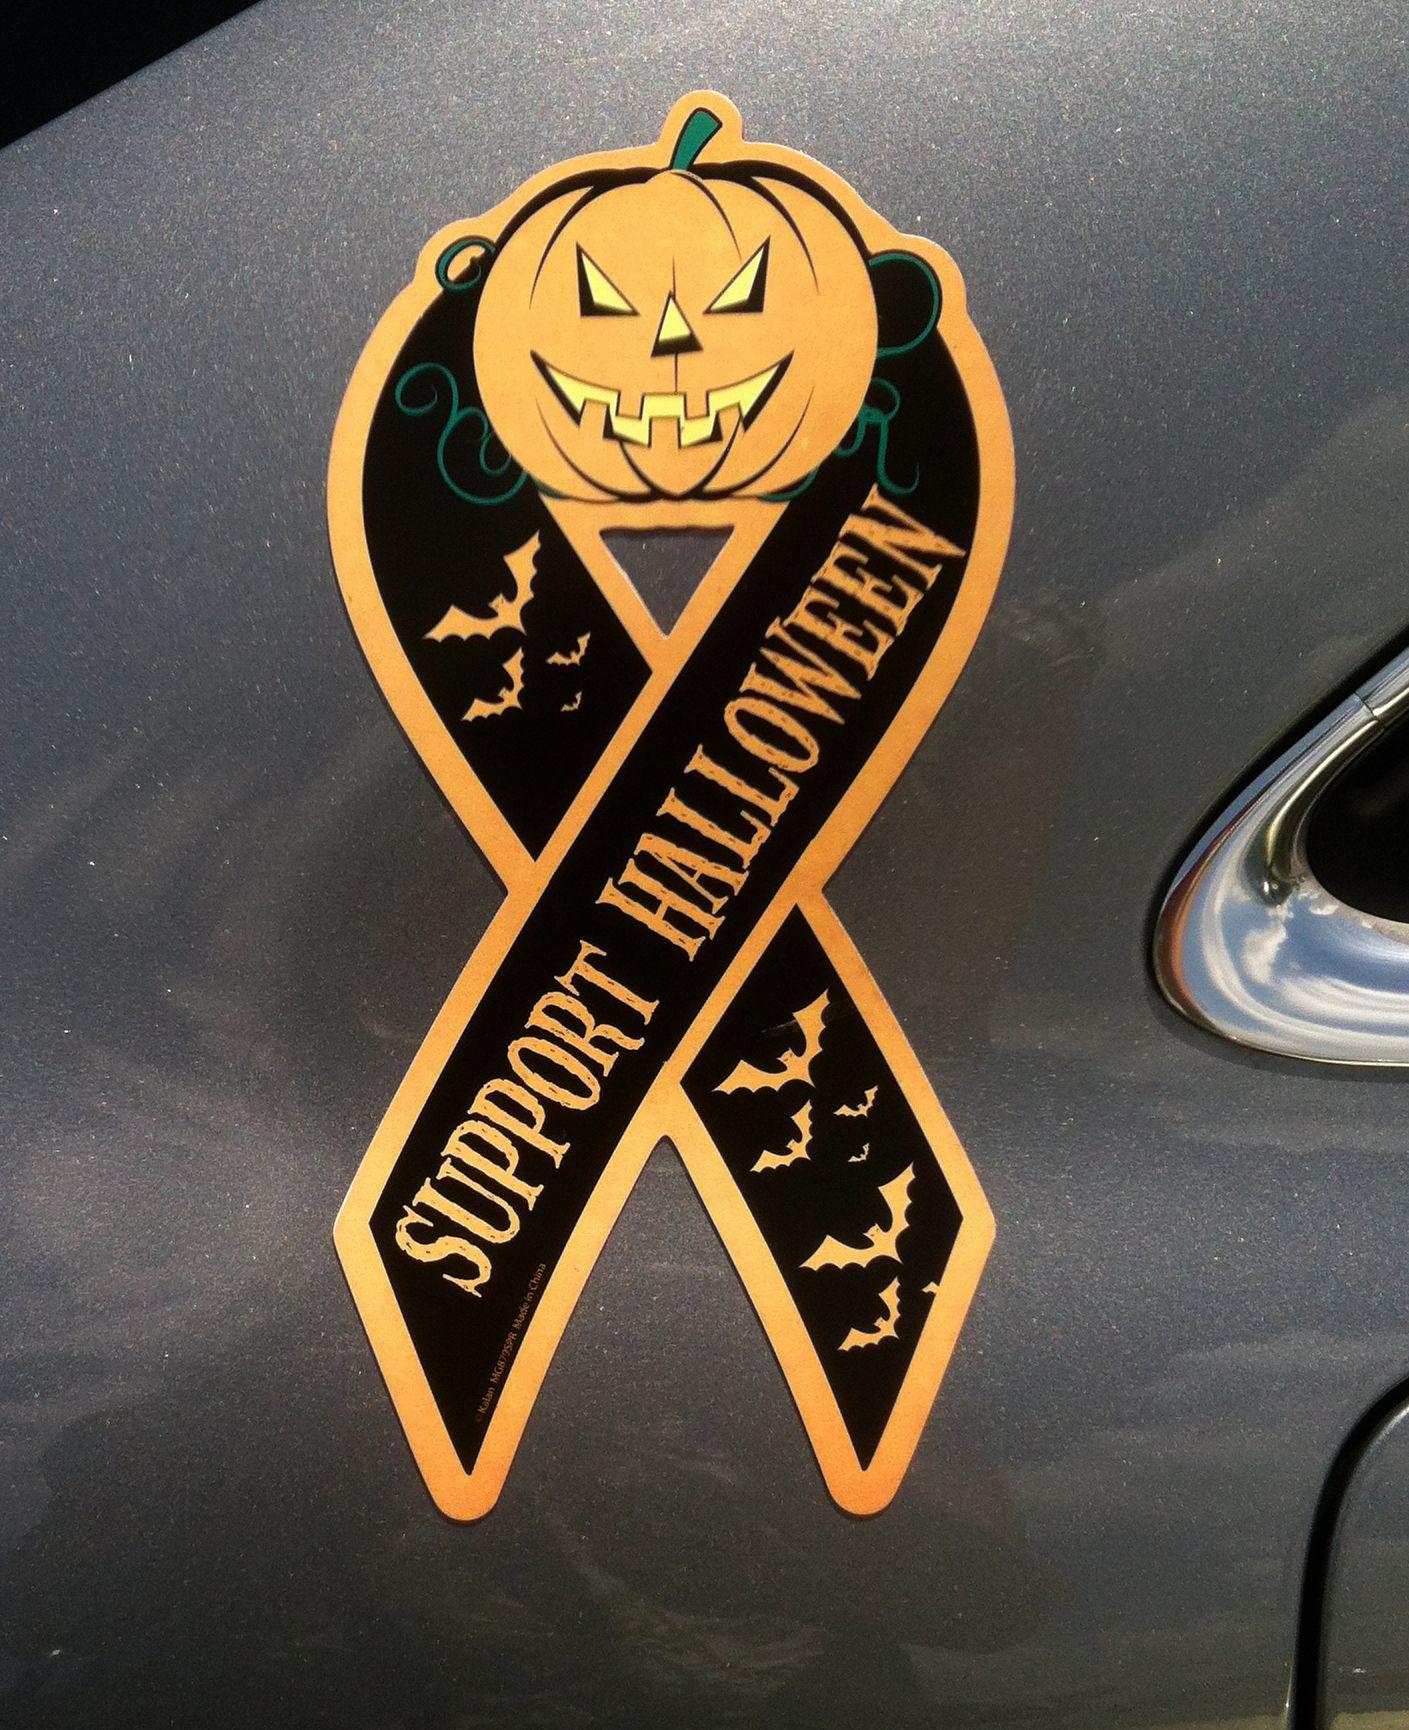 Support Halloween Car Sticker Halloween Inspiration Halloween Stickers Halloween [ 1730 x 1409 Pixel ]